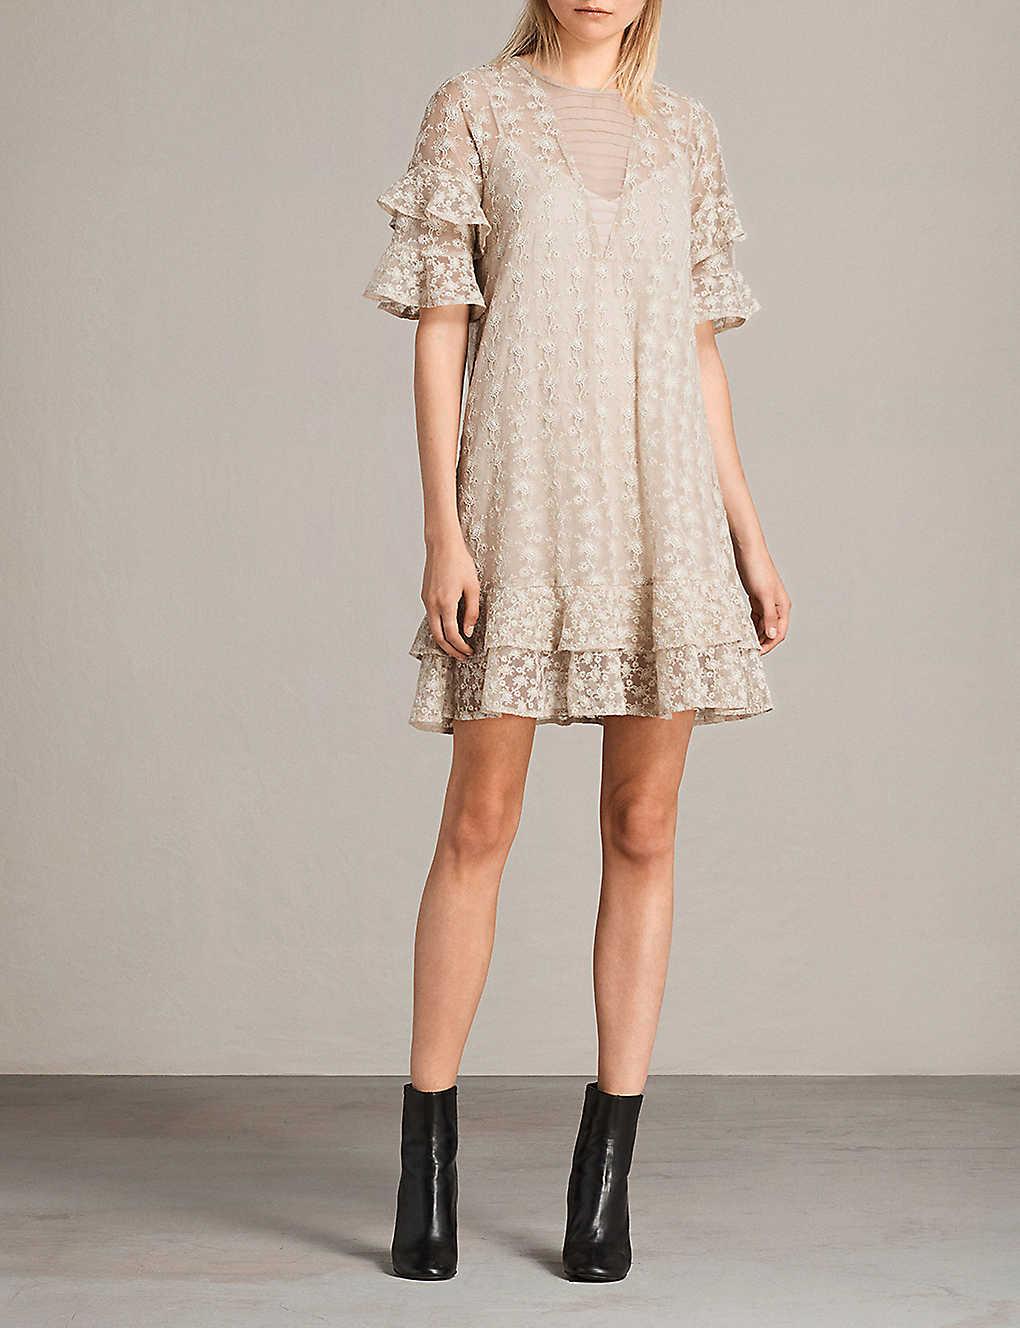 36c0633ee3 ALLSAINTS - Henrietta floral-embroidered mesh dress